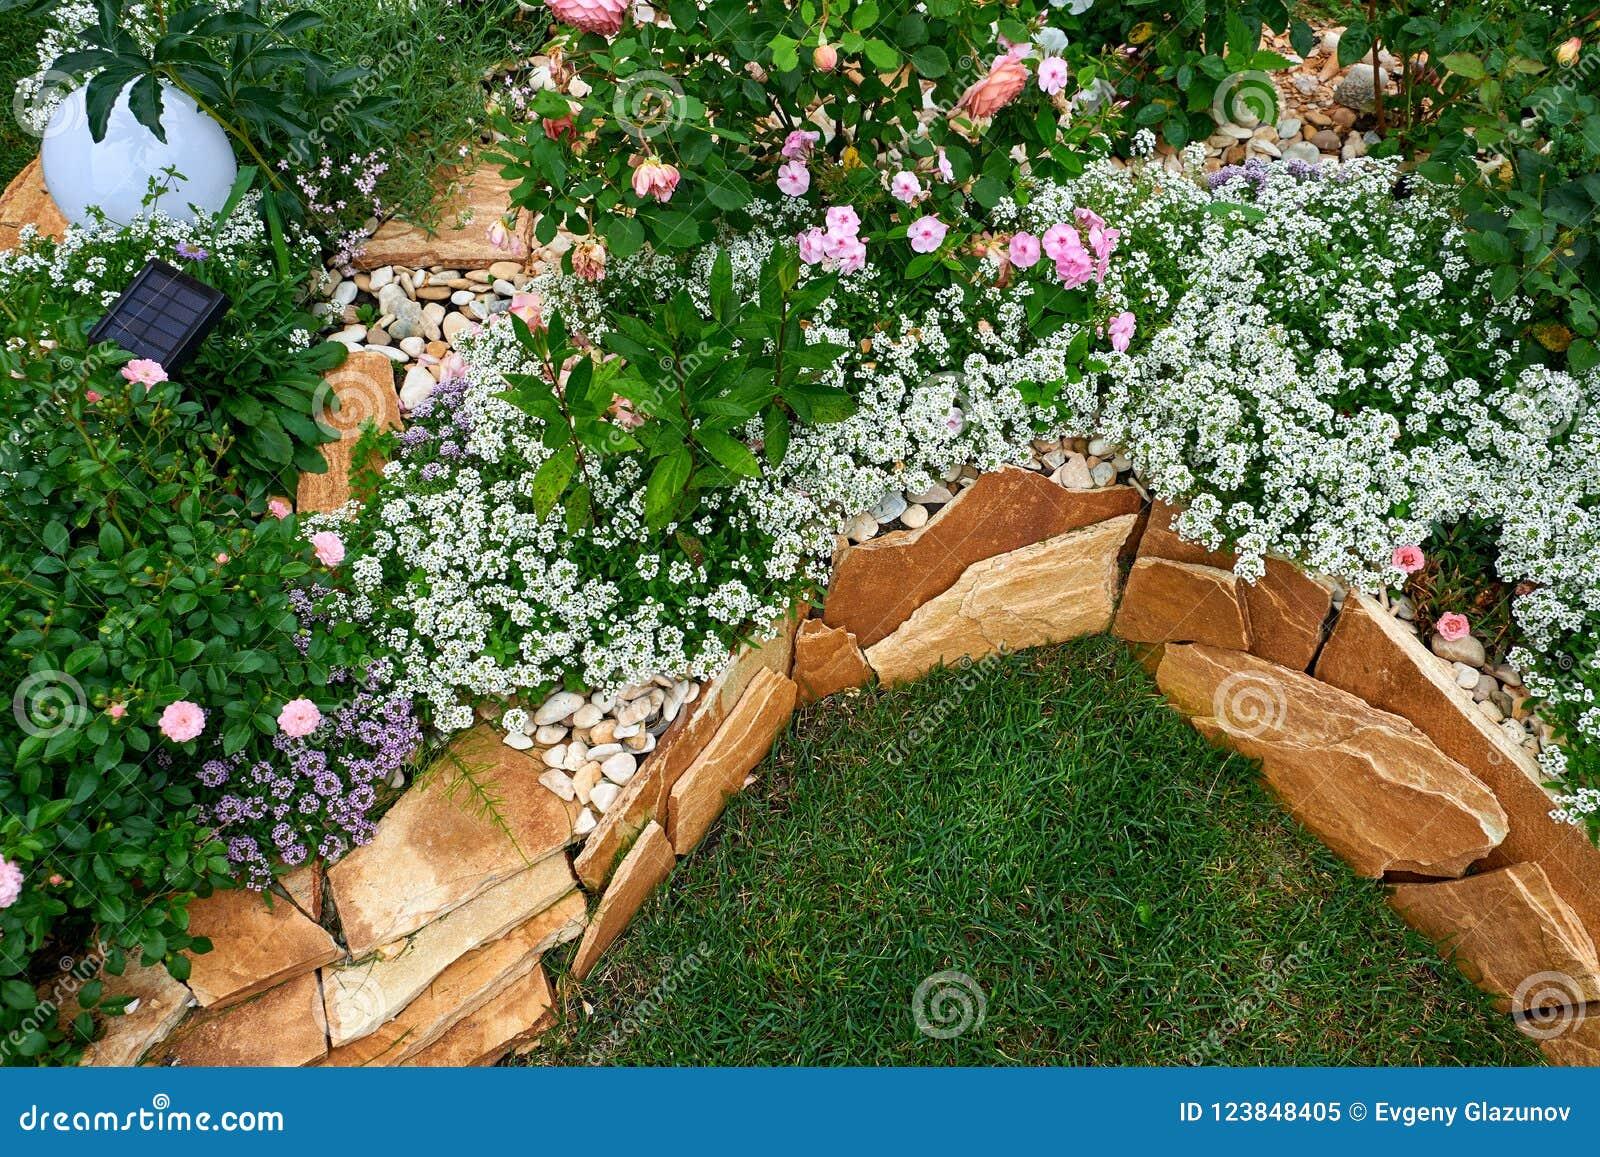 Garden Design. Flowerbed In The Yard In Landscape Design ... on natural water fountain design, natural building design, natural walkways, natural bird house design, leather bed design, natural landscaping design, natural wood design,